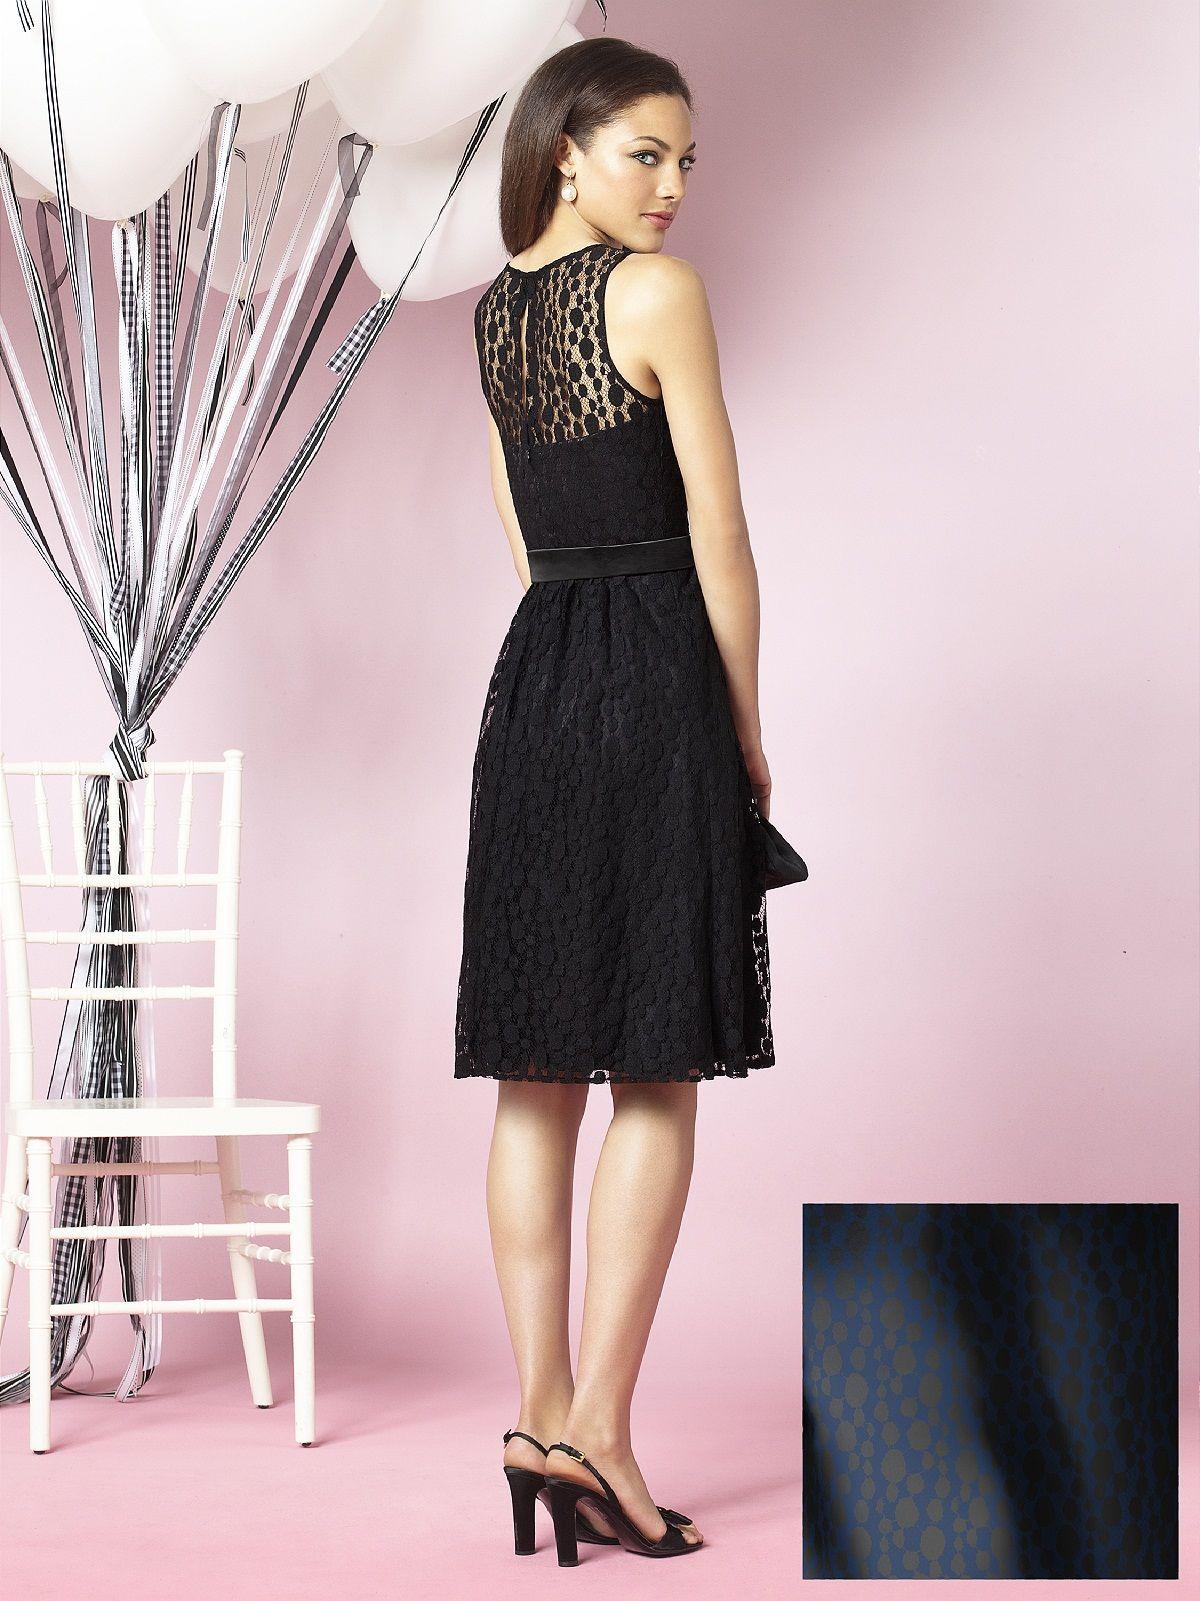 Little black dress for wedding party  Pin by Rachel Shoemaker on frocks  Pinterest  Frocks and Wedding